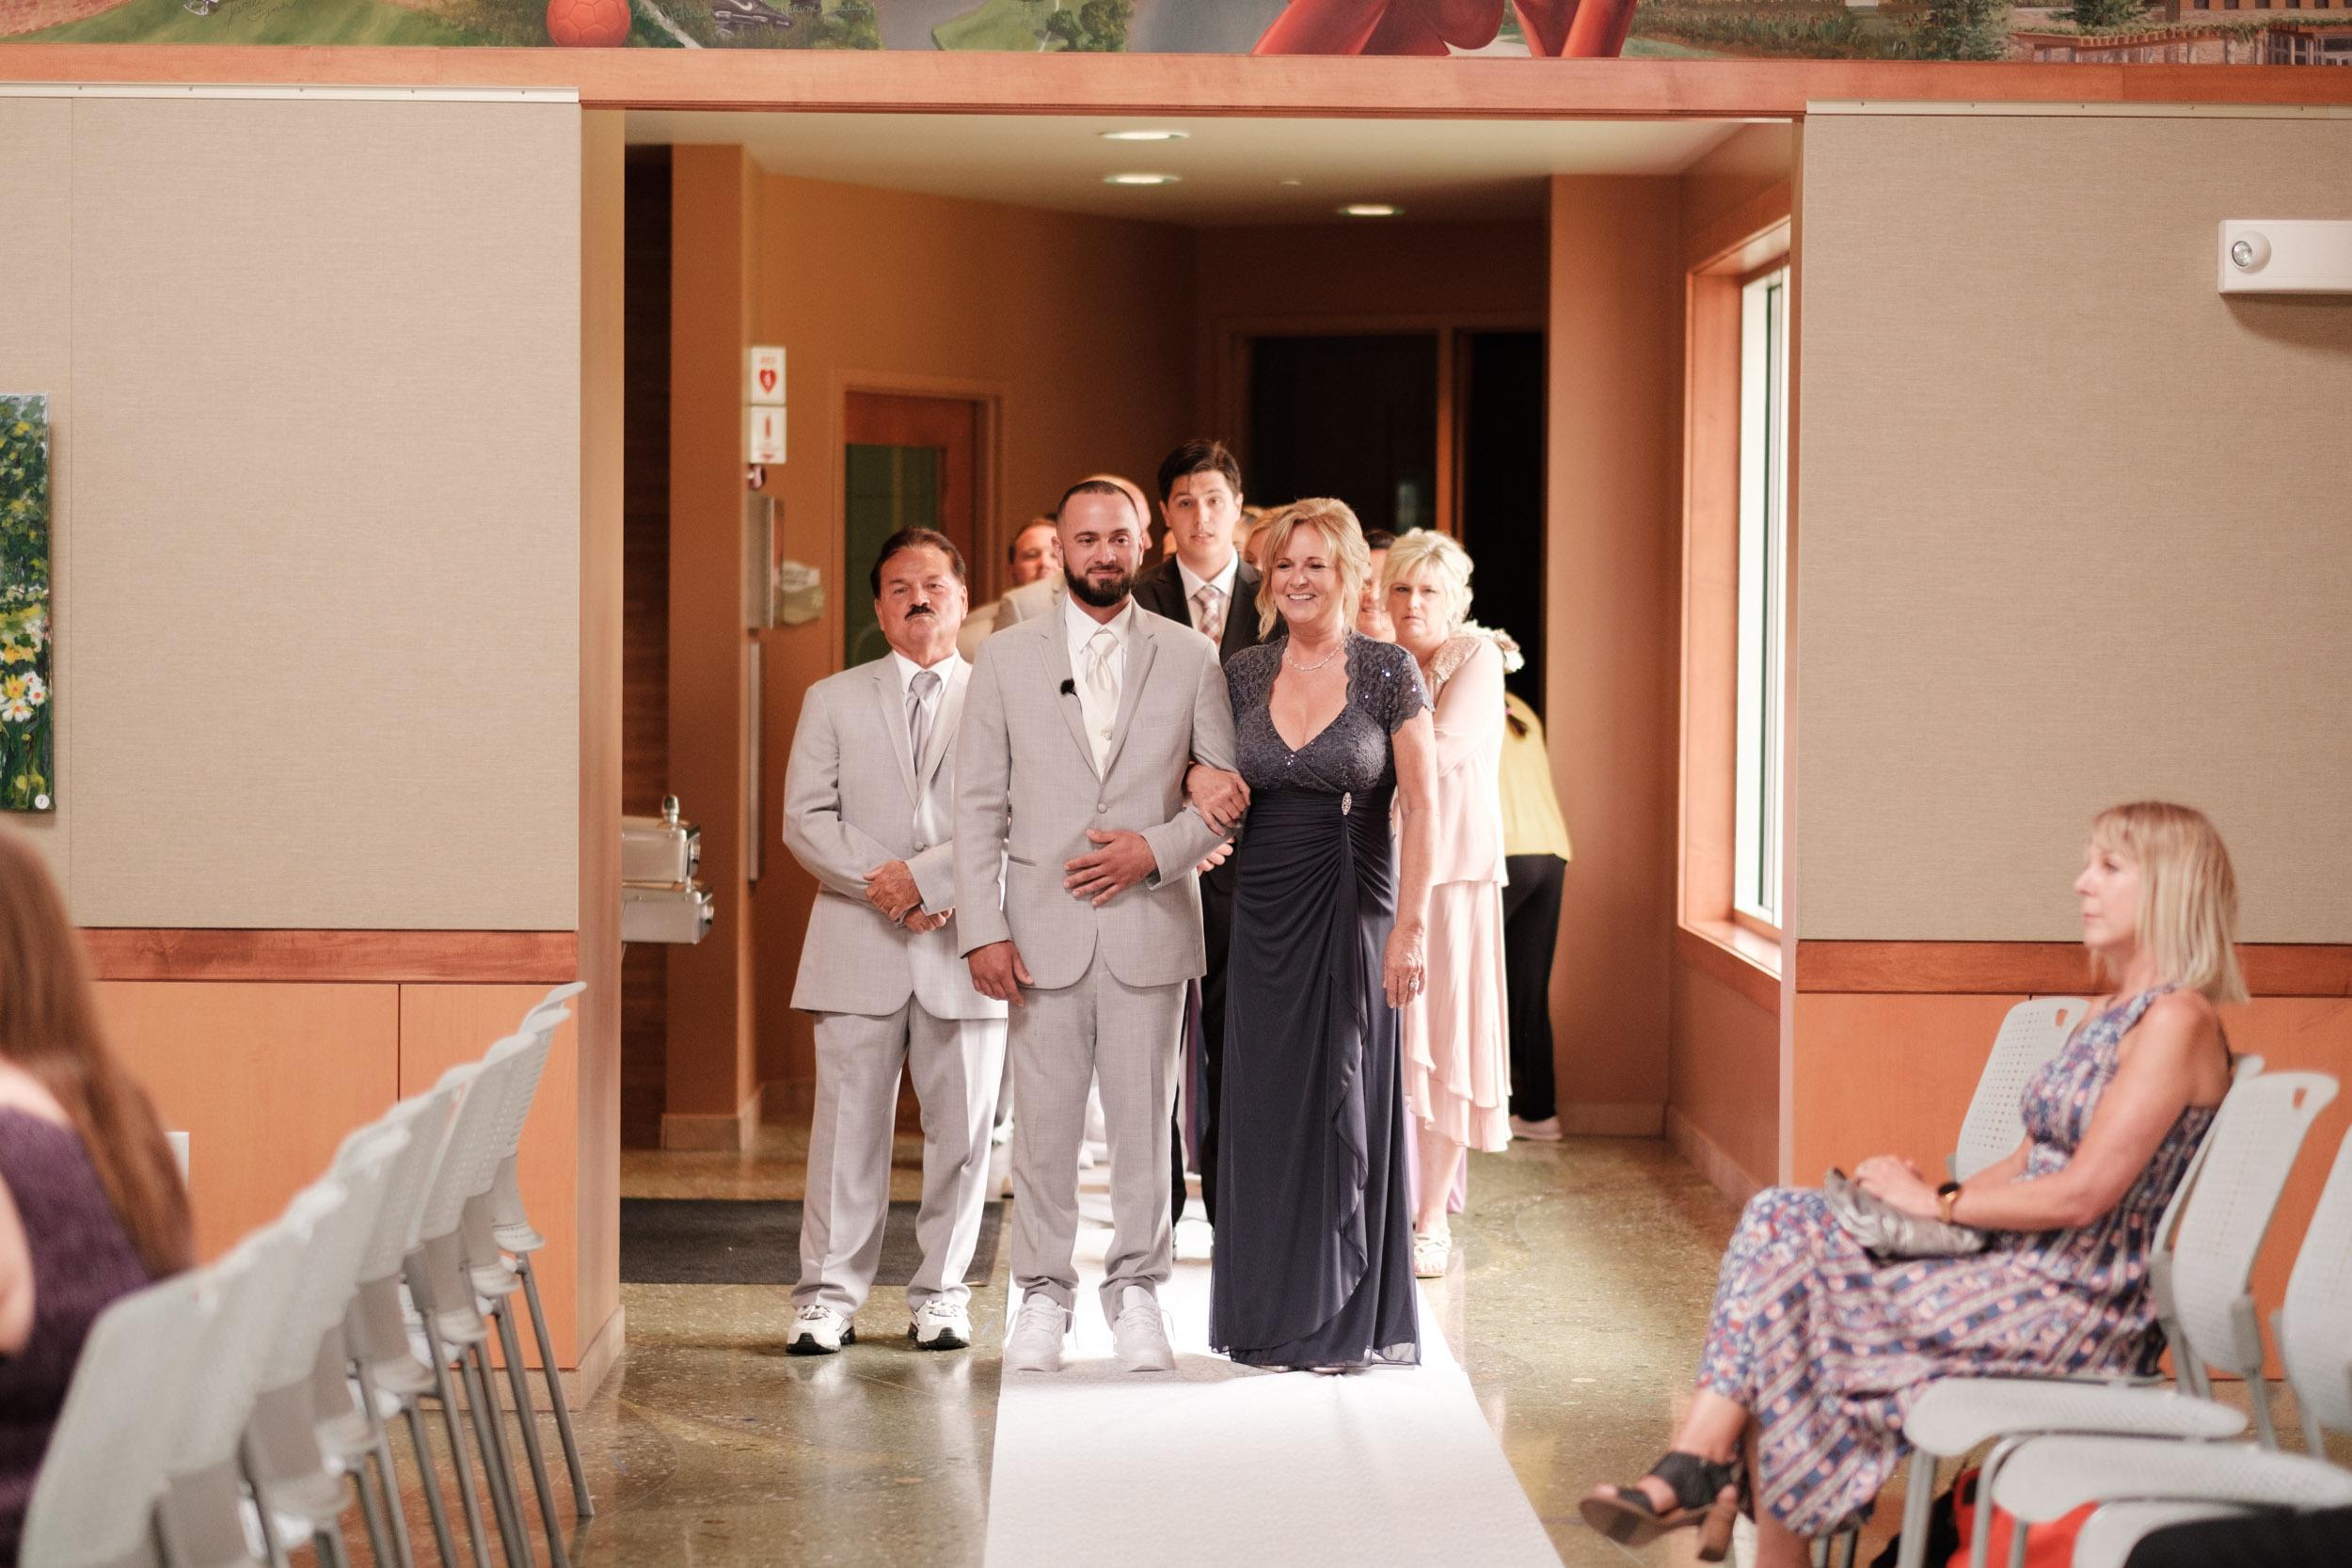 19-06-01 Megan Josh - Nicholas Conservatory Wedding-5.jpg